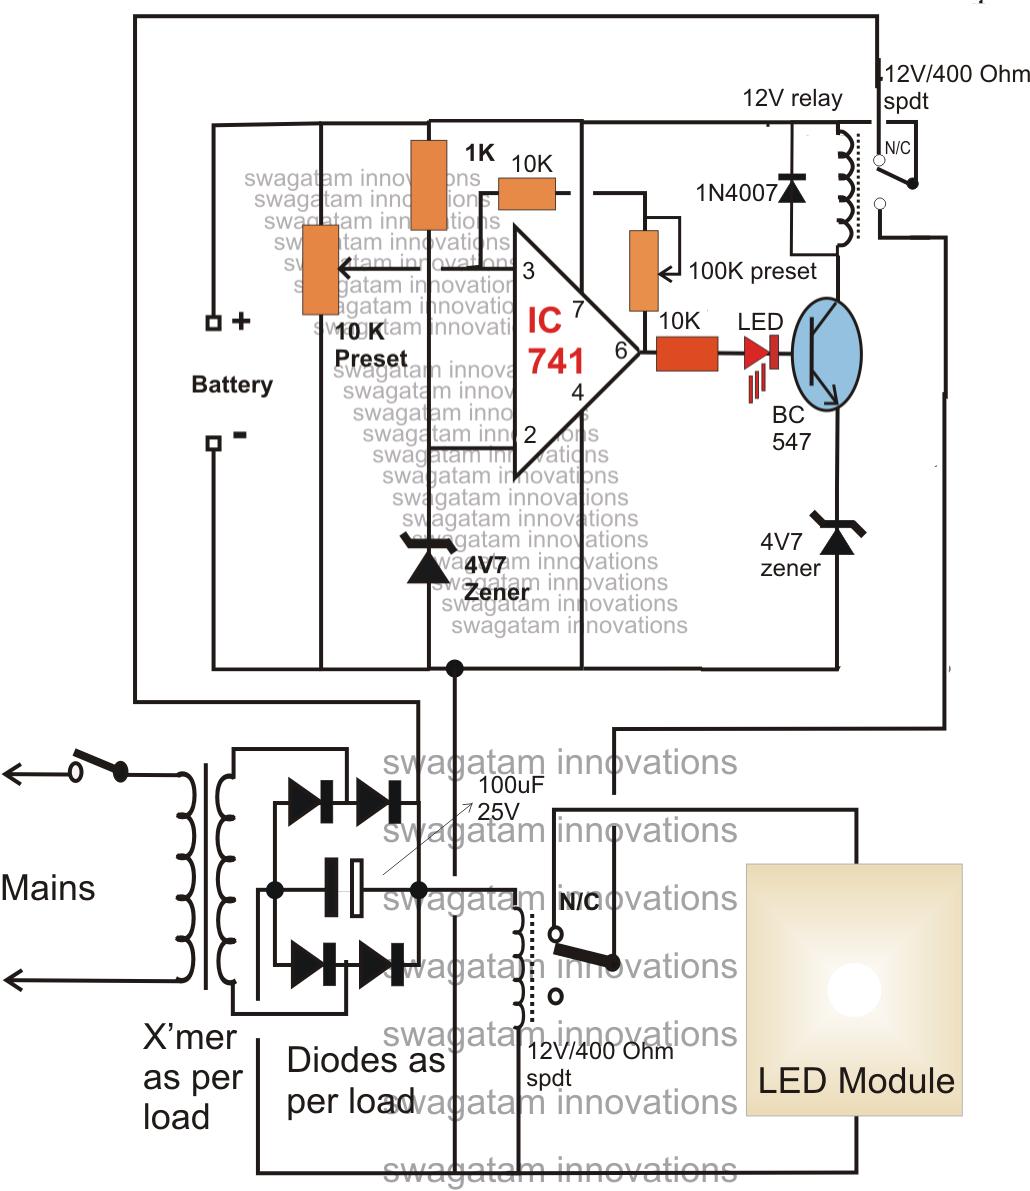 10 Watt Led Driver Circuit Diagram Sony Cdx M610 Wiring Make This Automatic To 1000 Emergency